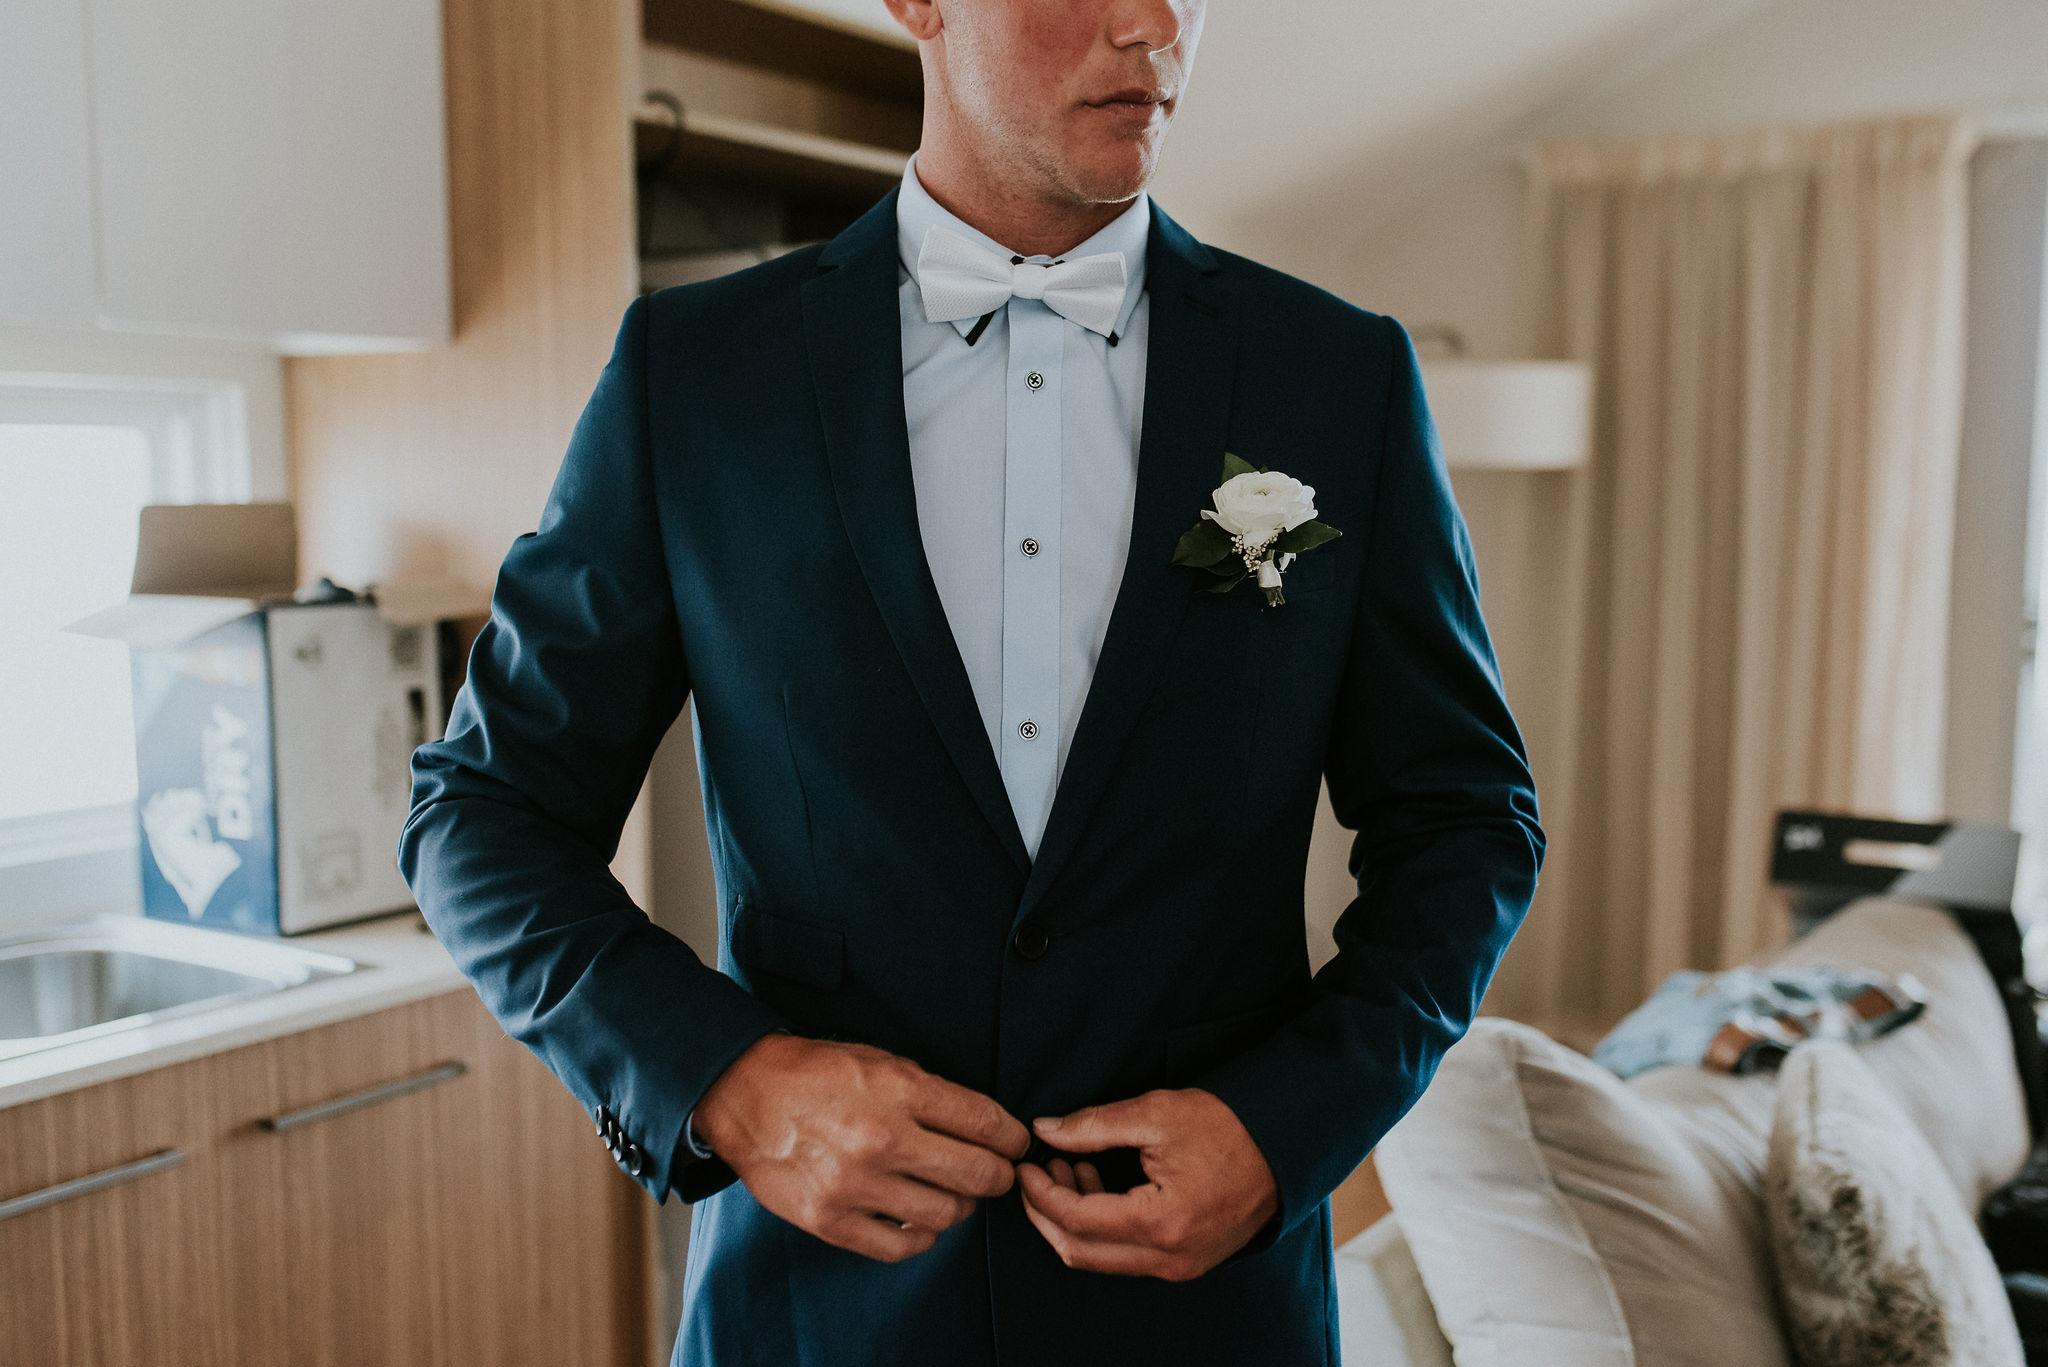 CAVES-BEACH-HOTEL-WEDDING-PATTEN-240.jpg